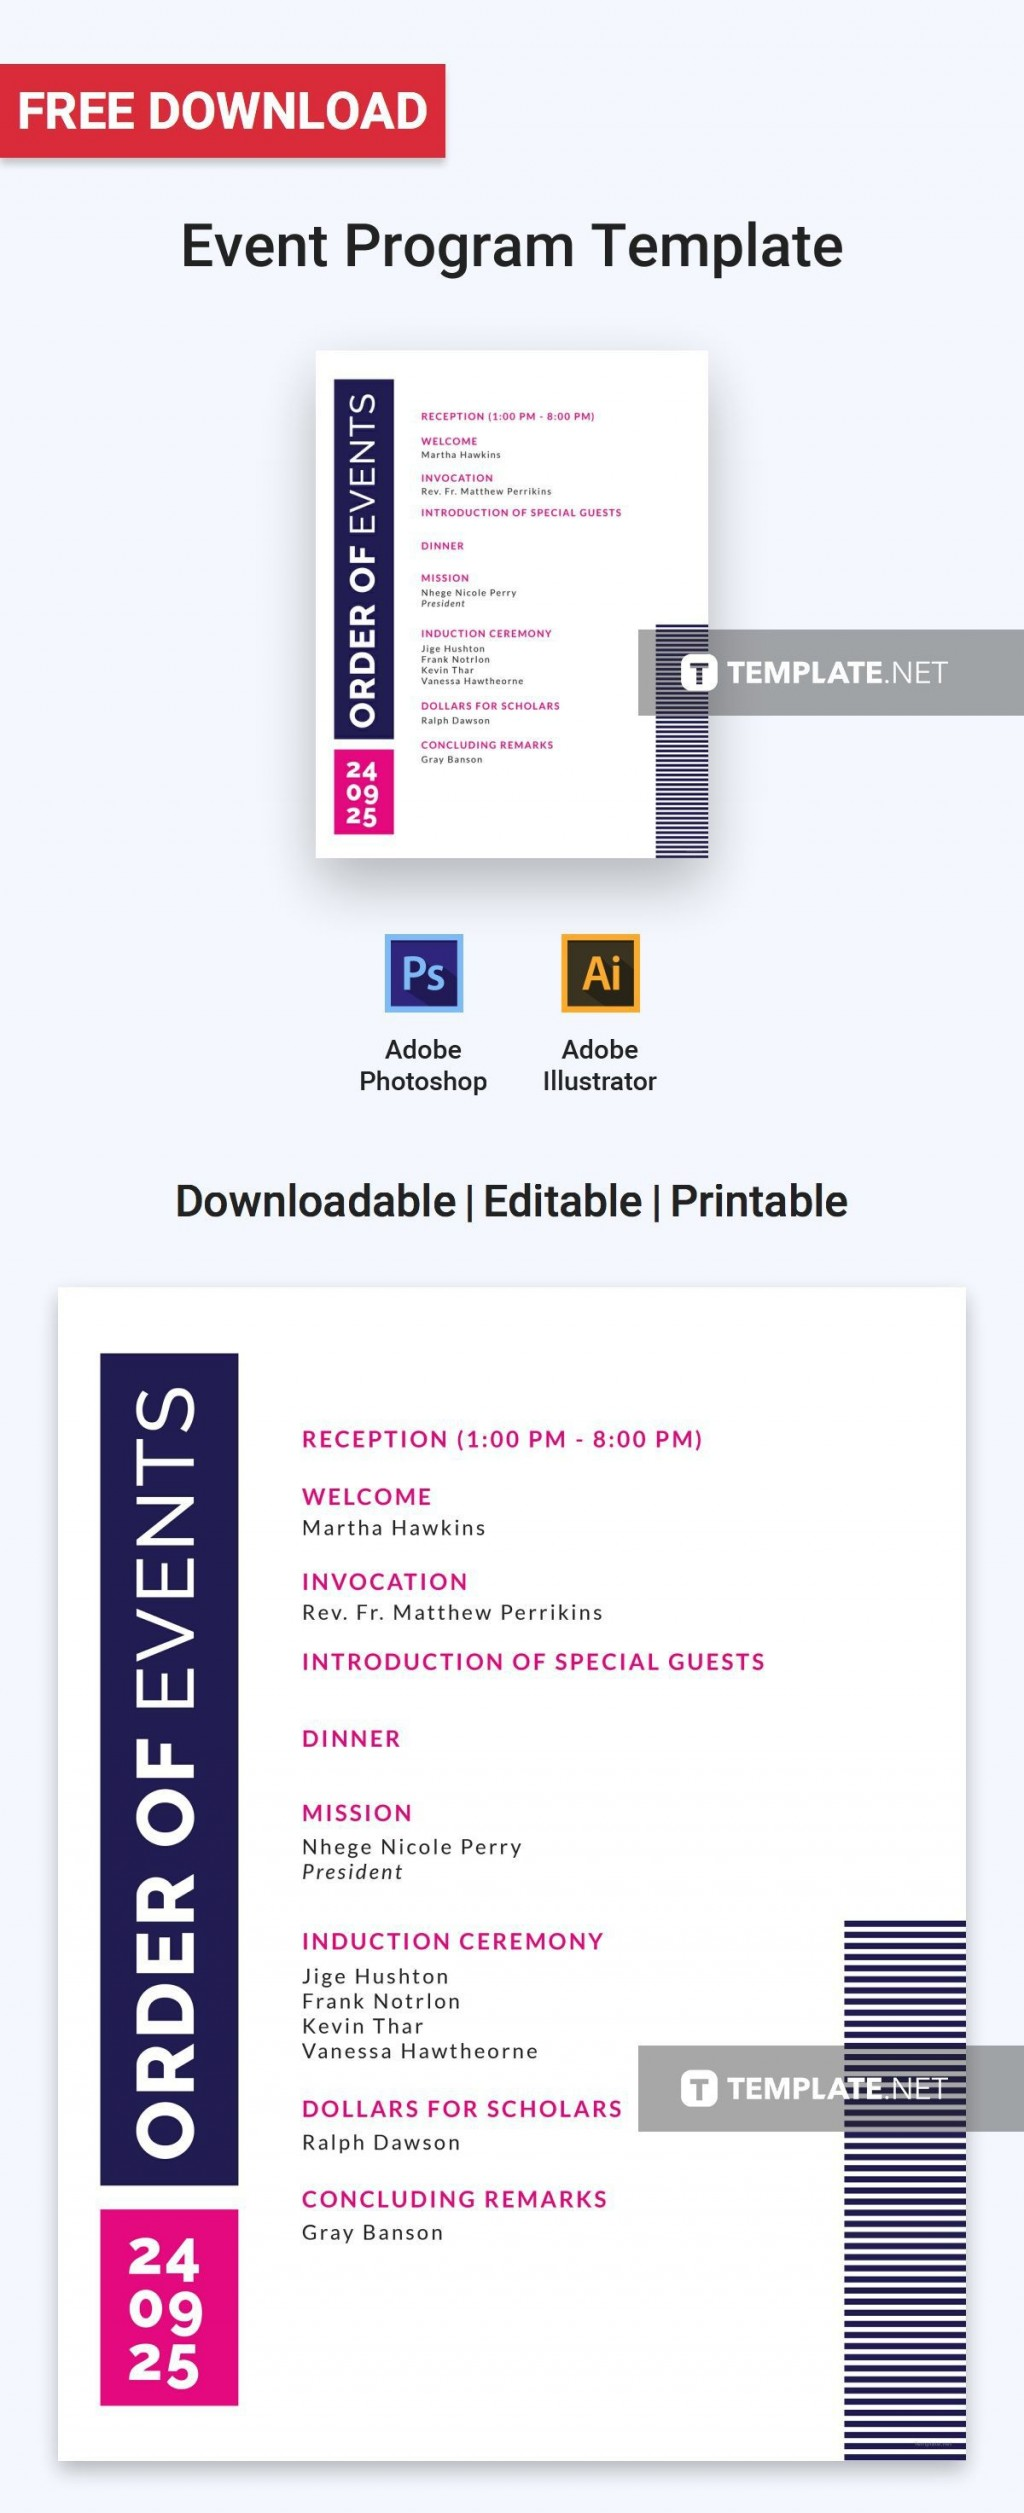 004 Simple Free Event Program Template Concept  Templates Half Fold Online DownloadLarge